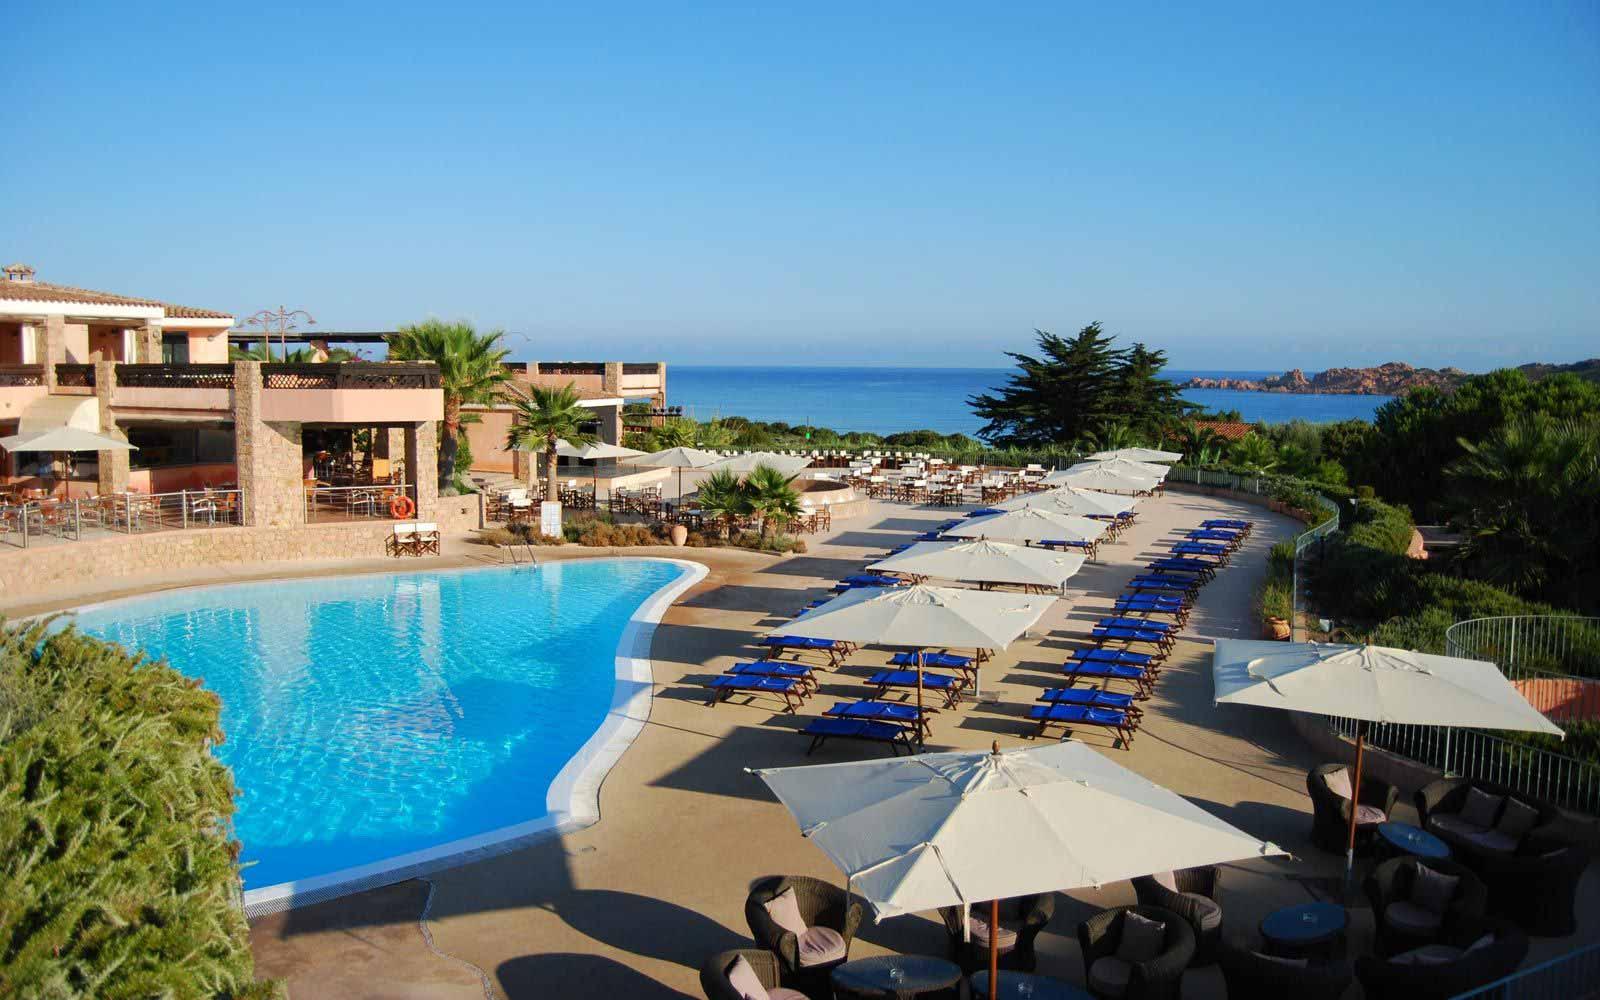 Lower swimming pool at Hotel Marinedda Thalasso & Spa